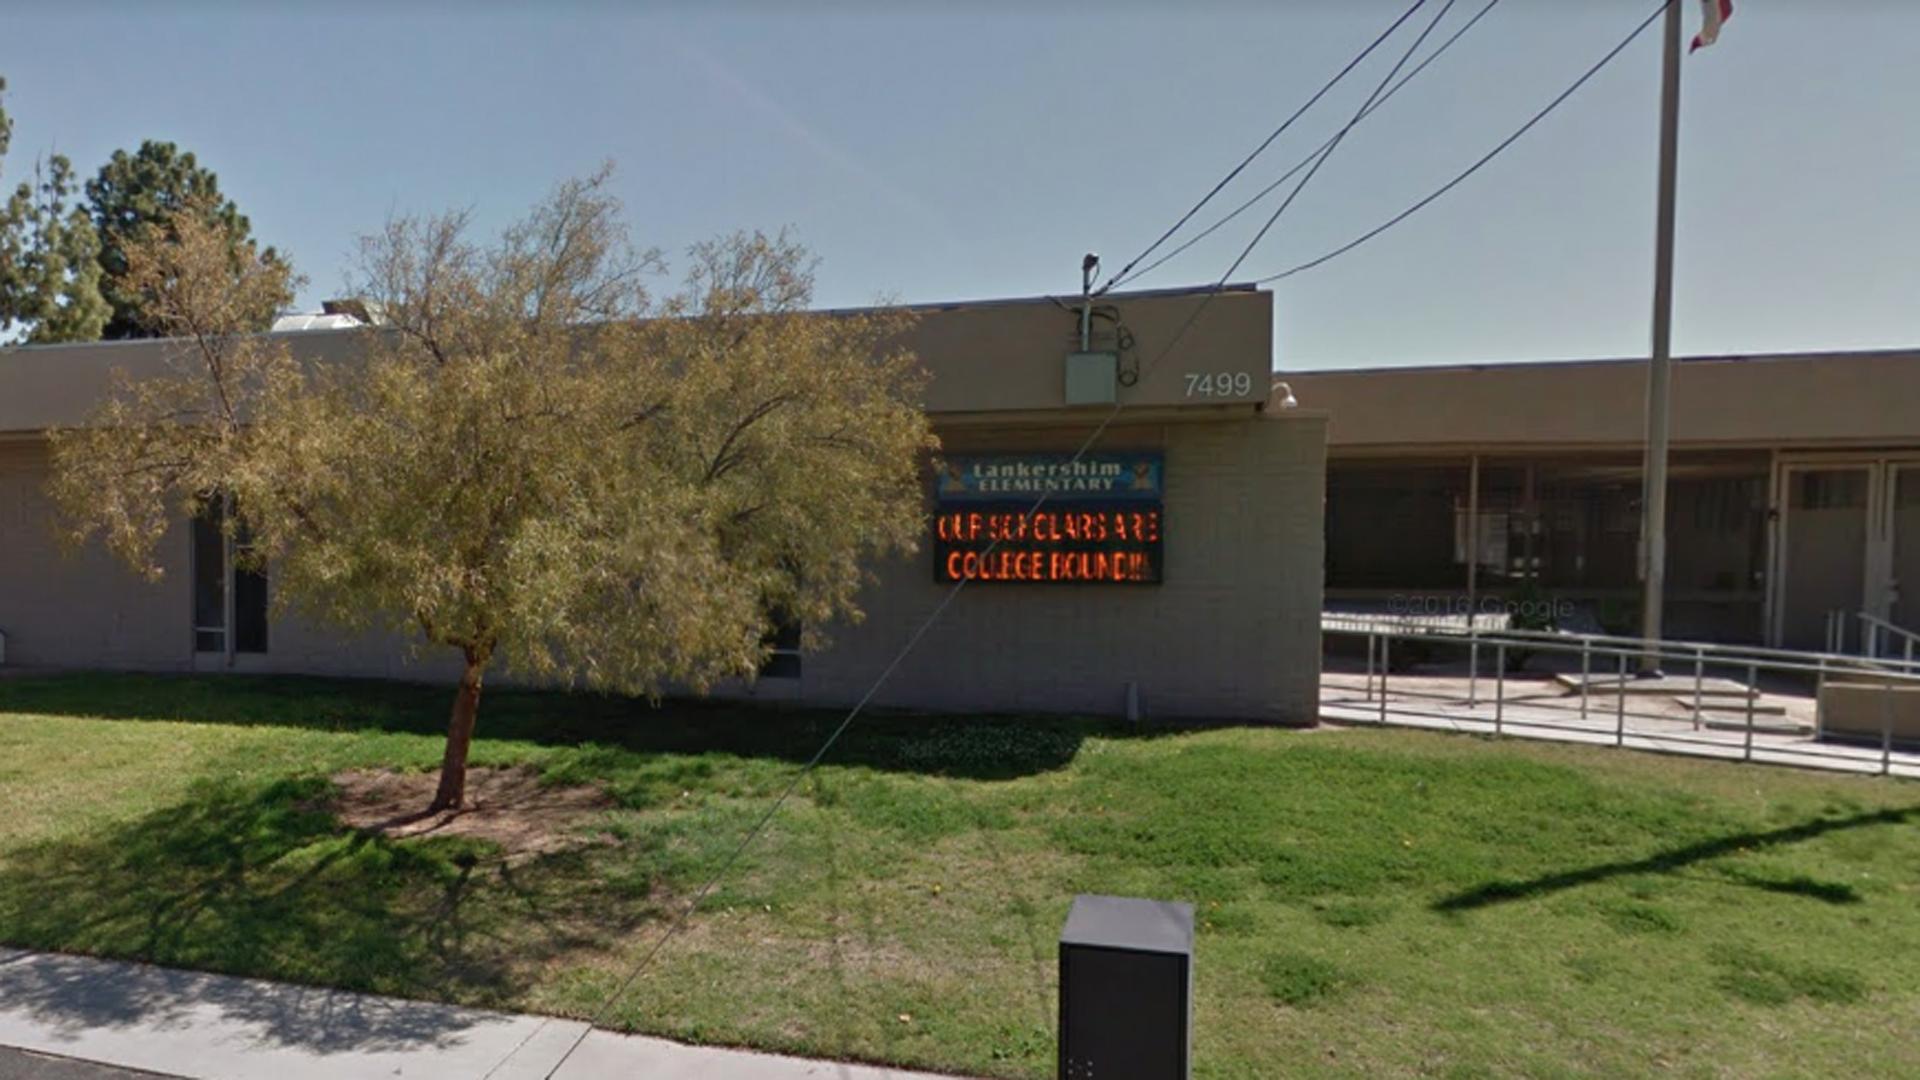 Lankershim Elementary School in San Bernardino is seen in a Google Maps street view image.